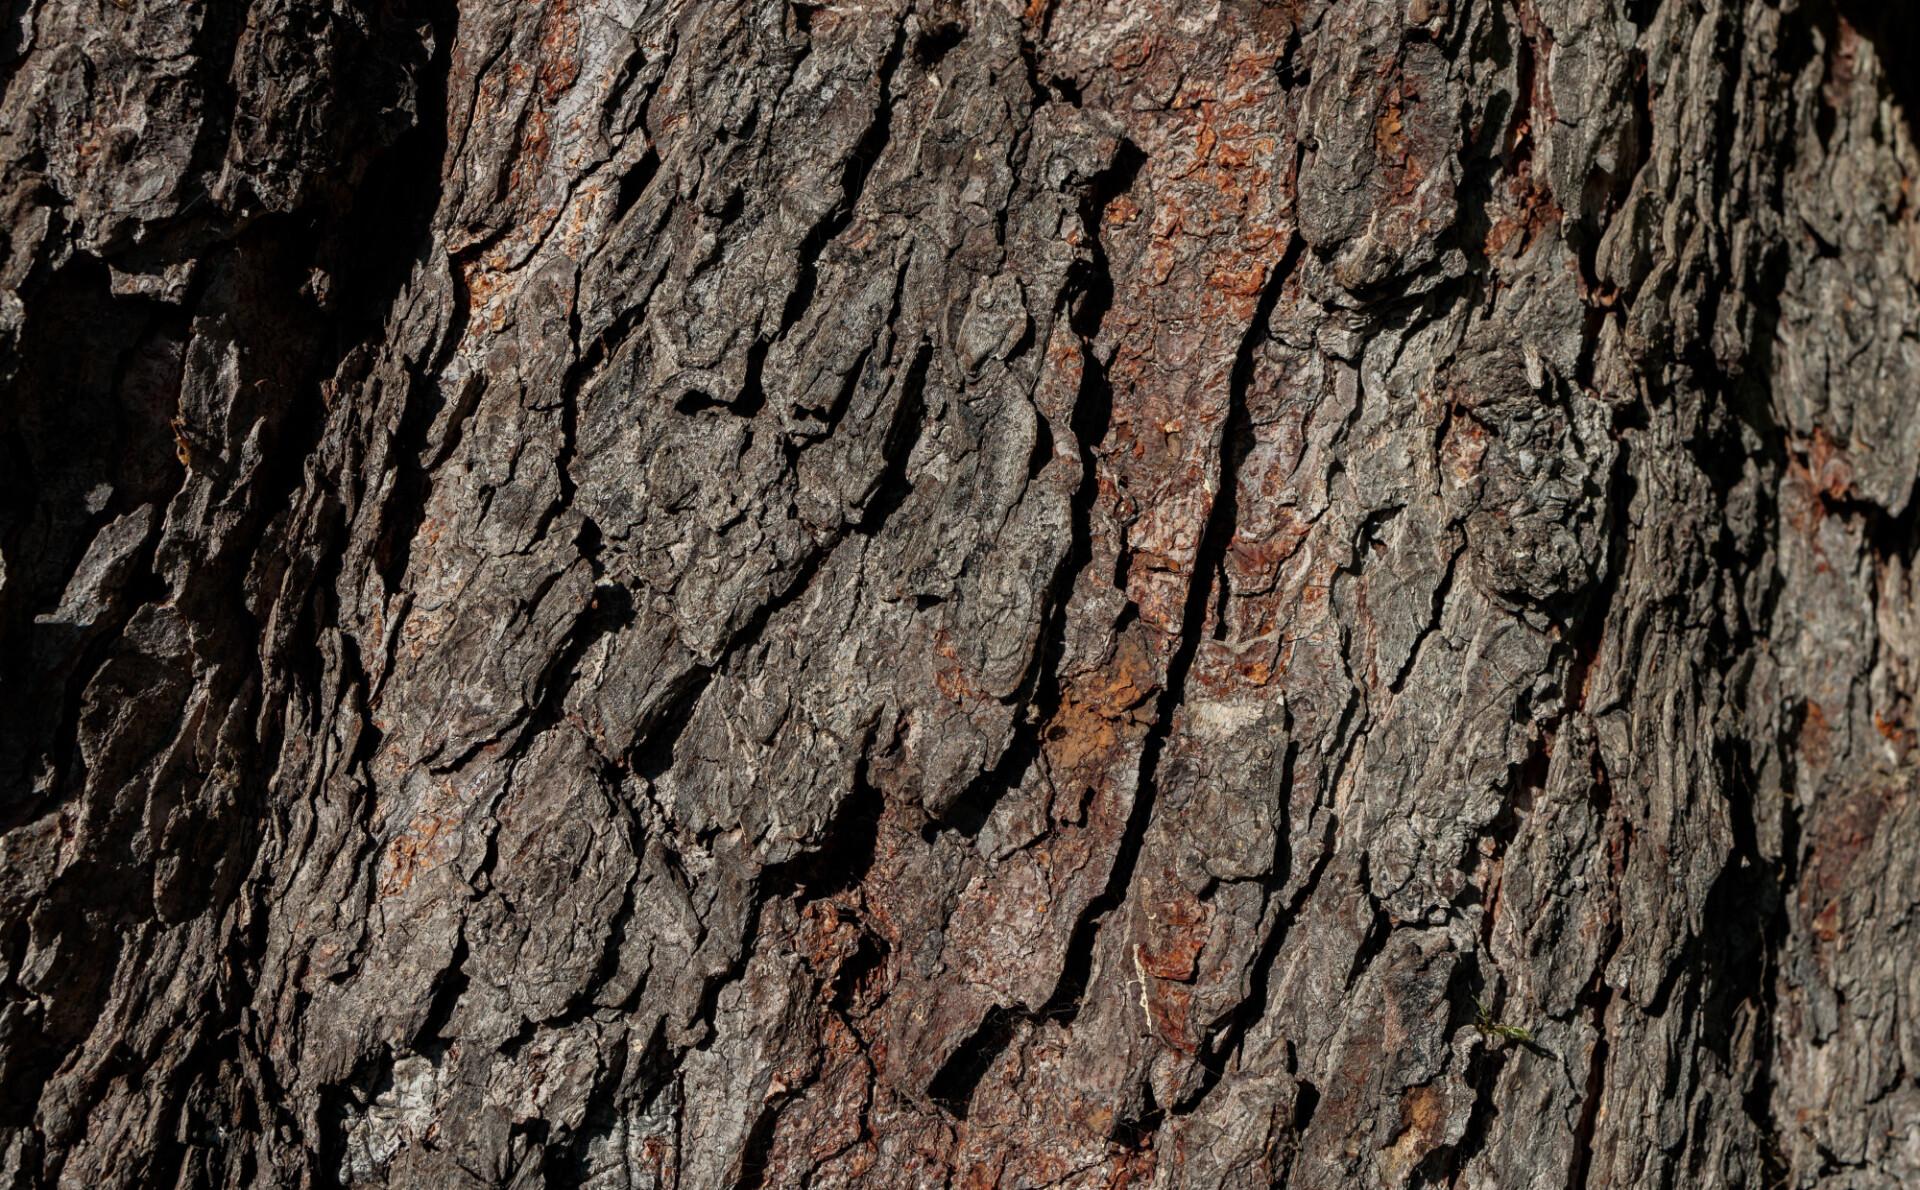 Bark of a chestnut tree